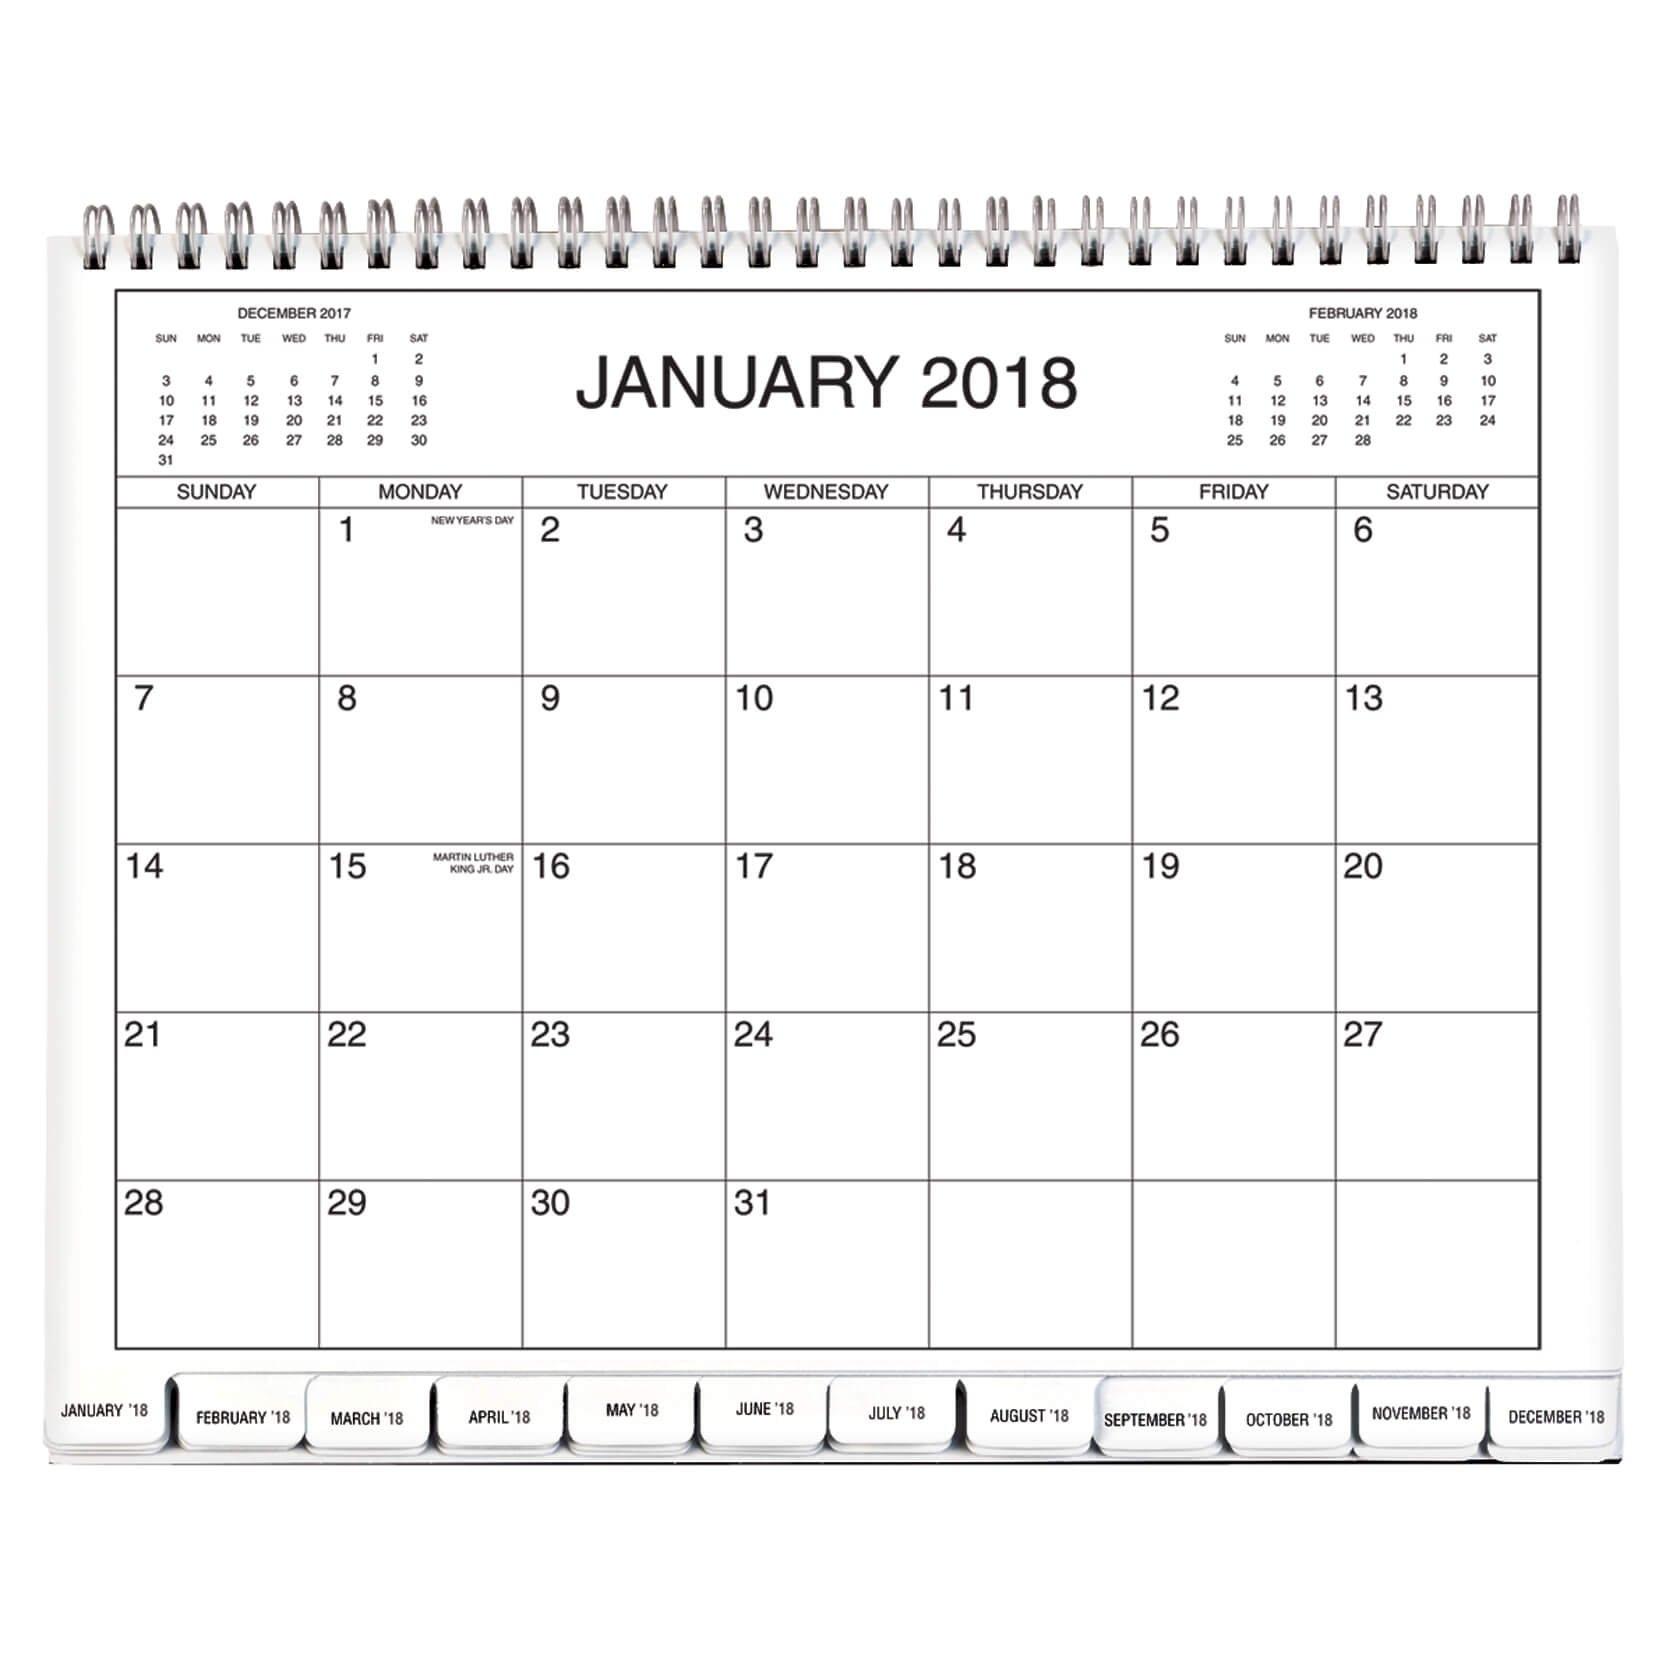 5 Year Calendar 2018-2019-2020-2021-2022 - Monthly Calendar - Walter Calendar 2019 For Sale